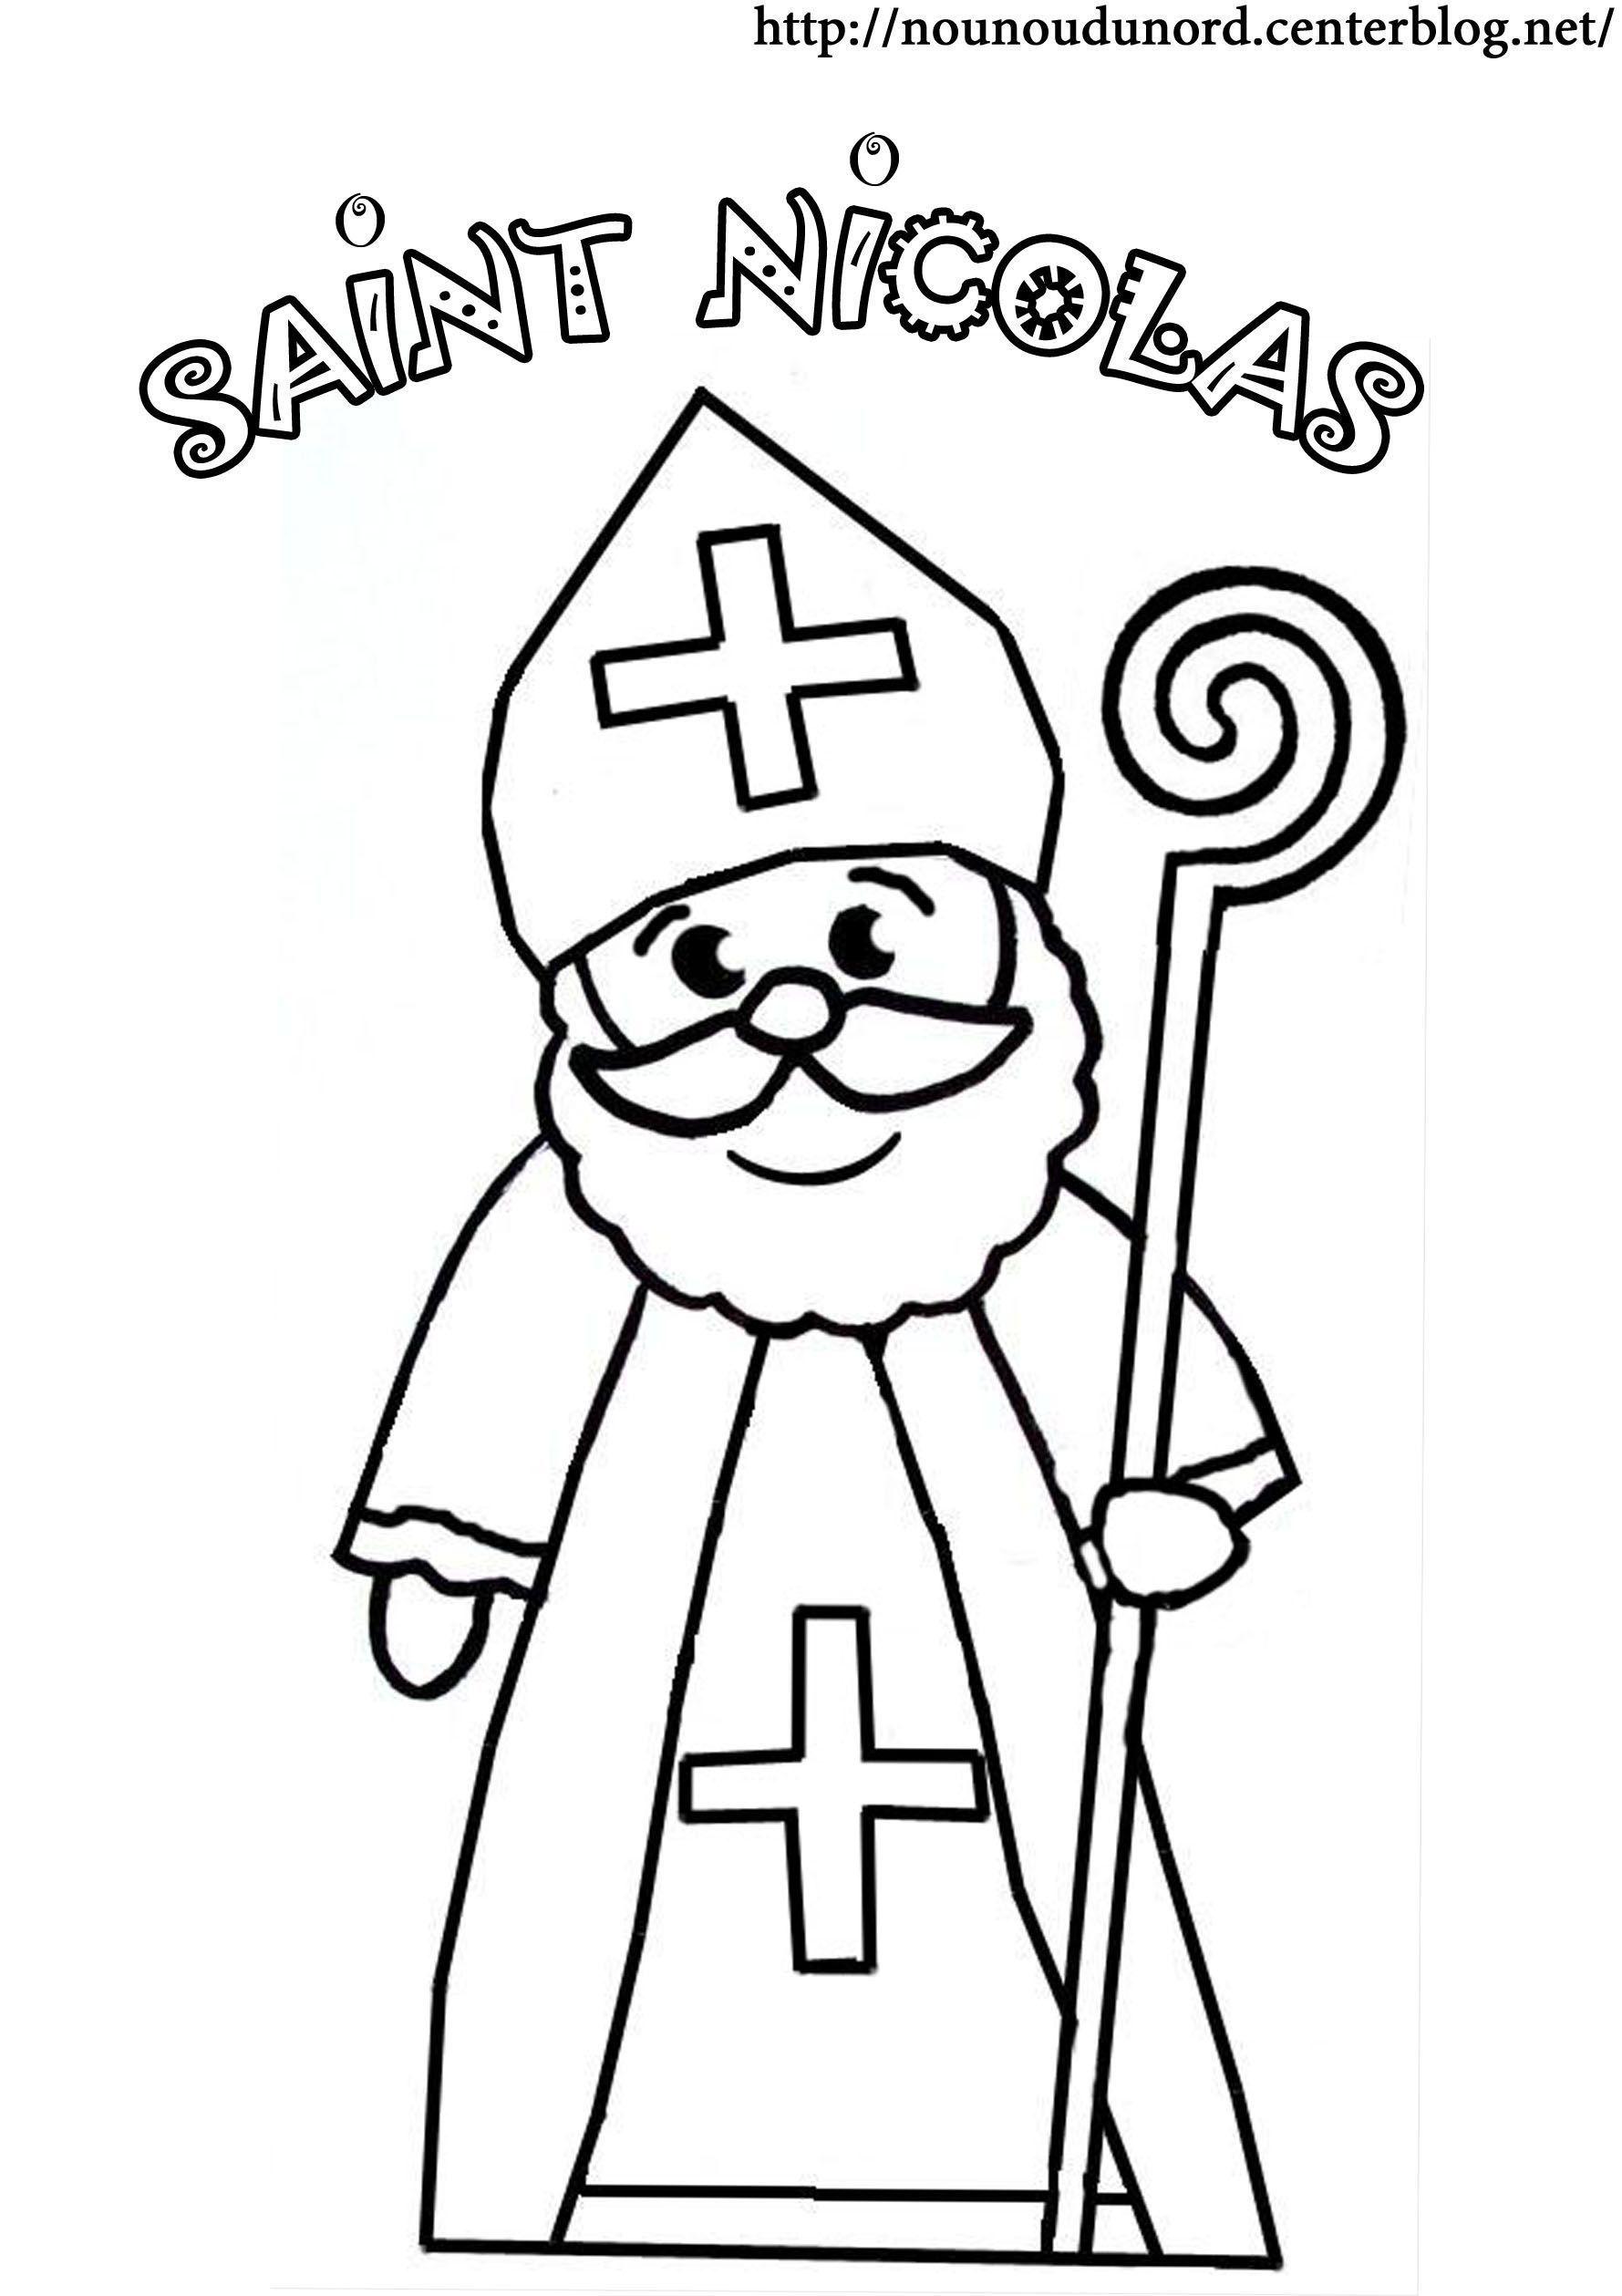 Coloriage saint nicolas - Dessine gratuit ...